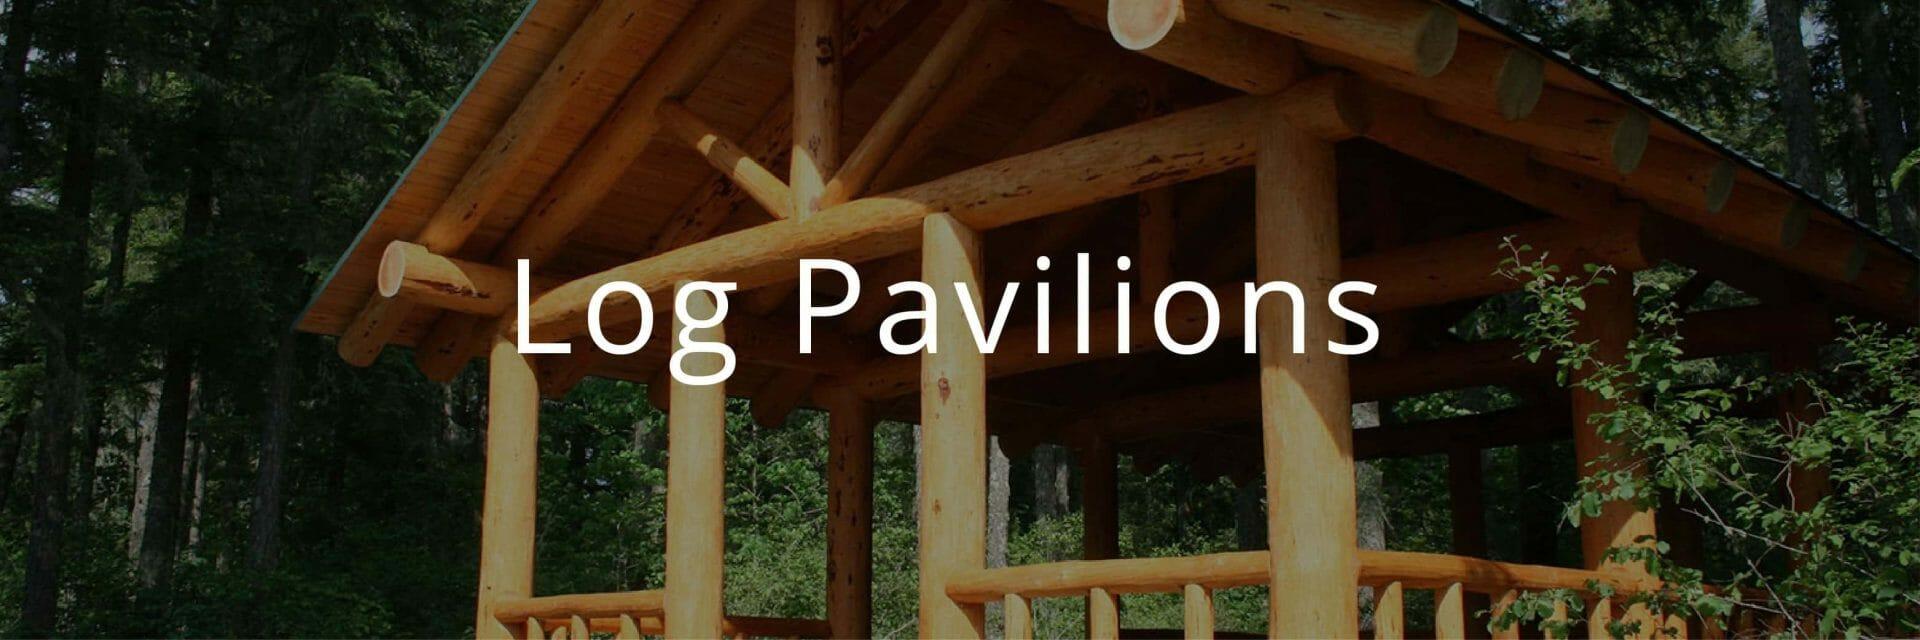 Log Pavilion with Side Railing